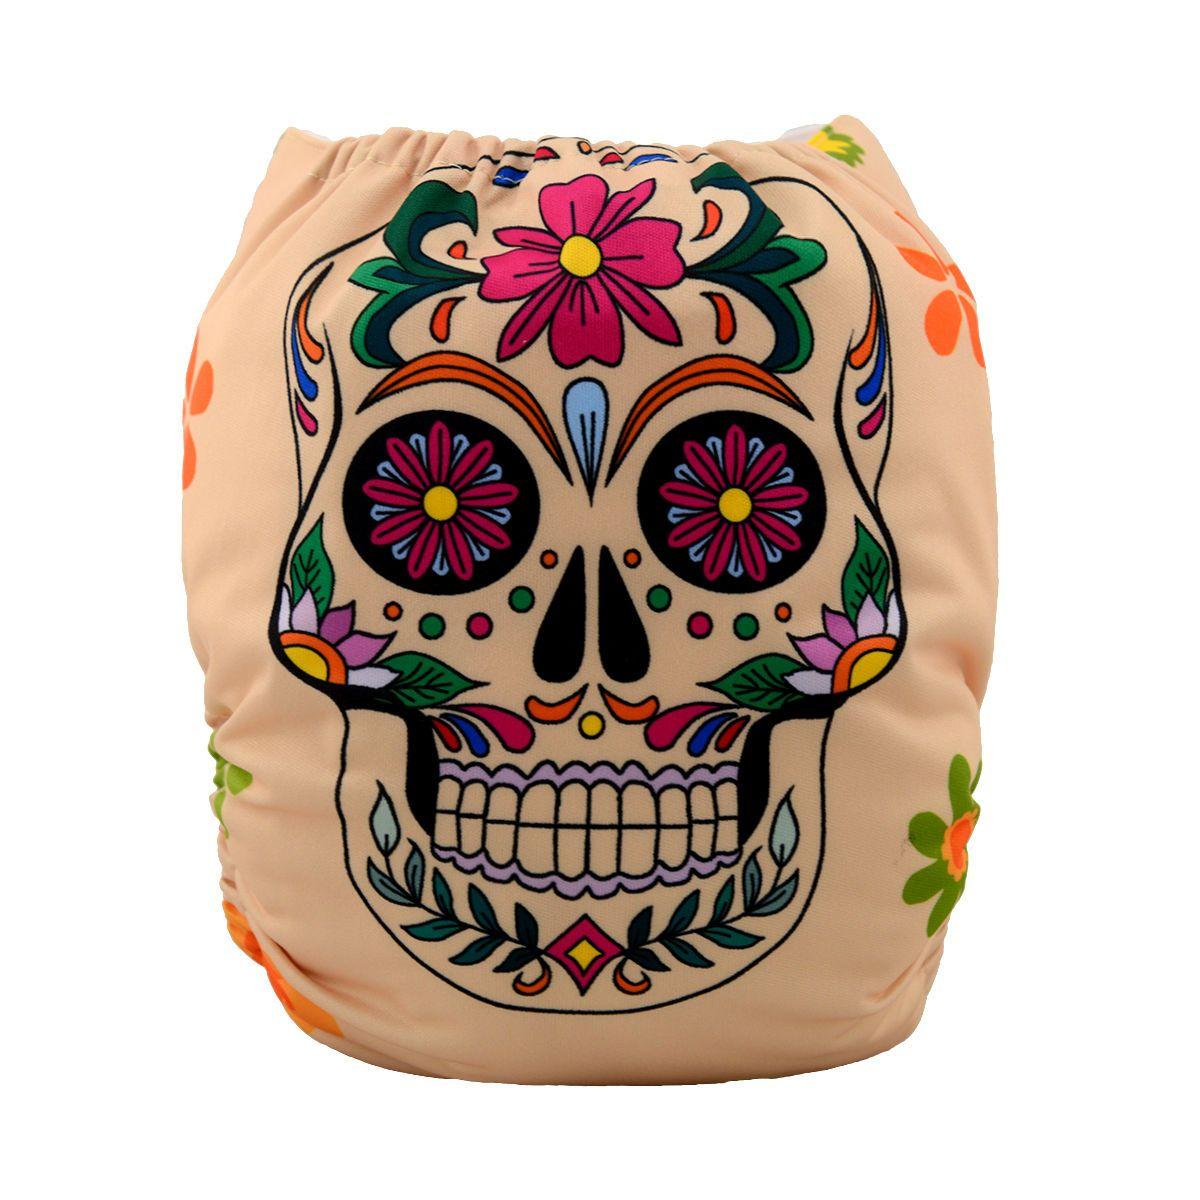 JinoBaby Washable Diaper with 1 Bamboo Insert - Fashion Skull